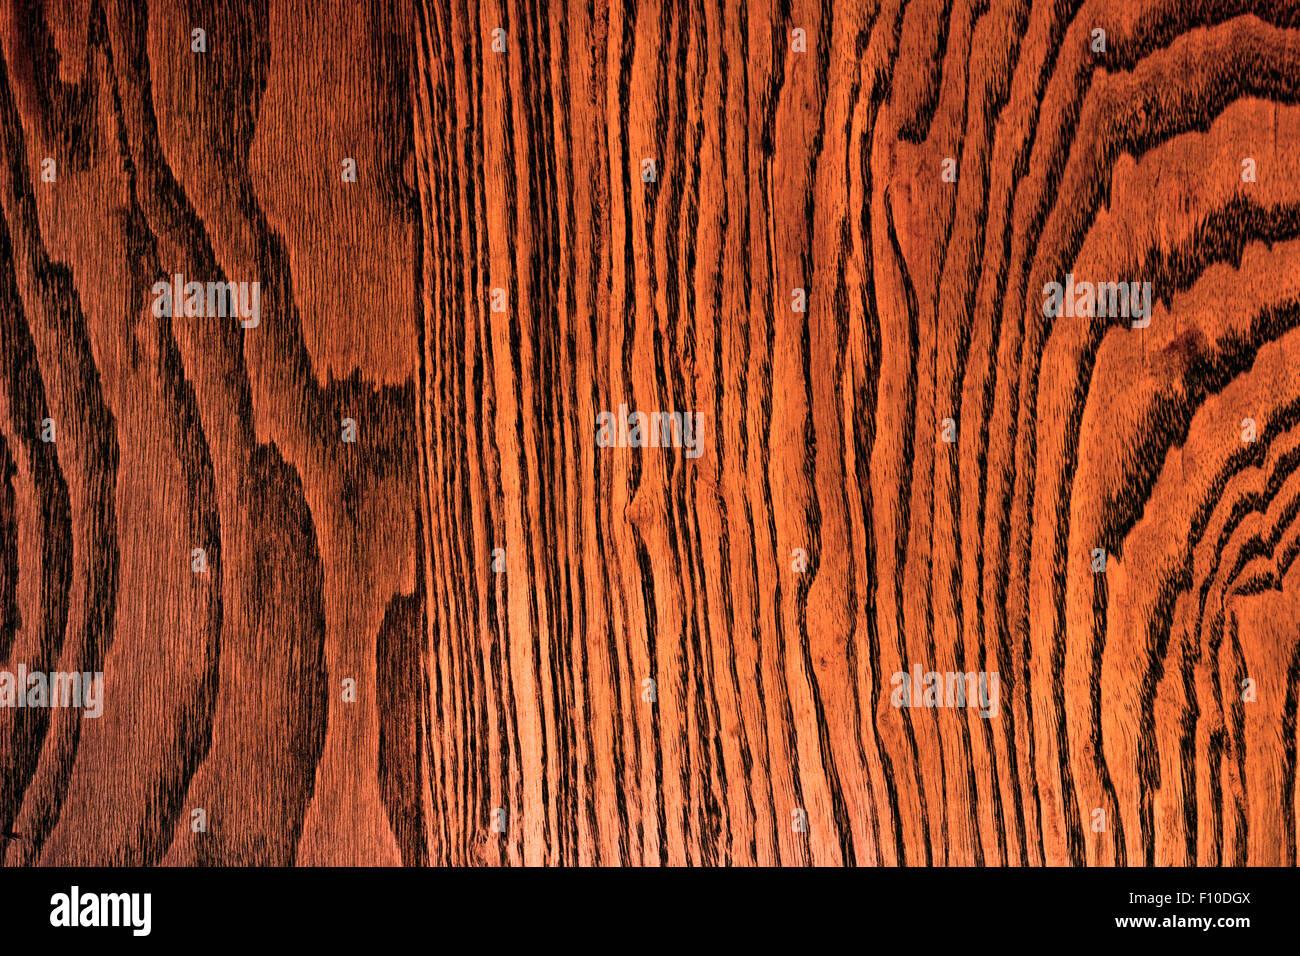 Tiger Oak Wood Grain Texture Stock Photo Royalty Free